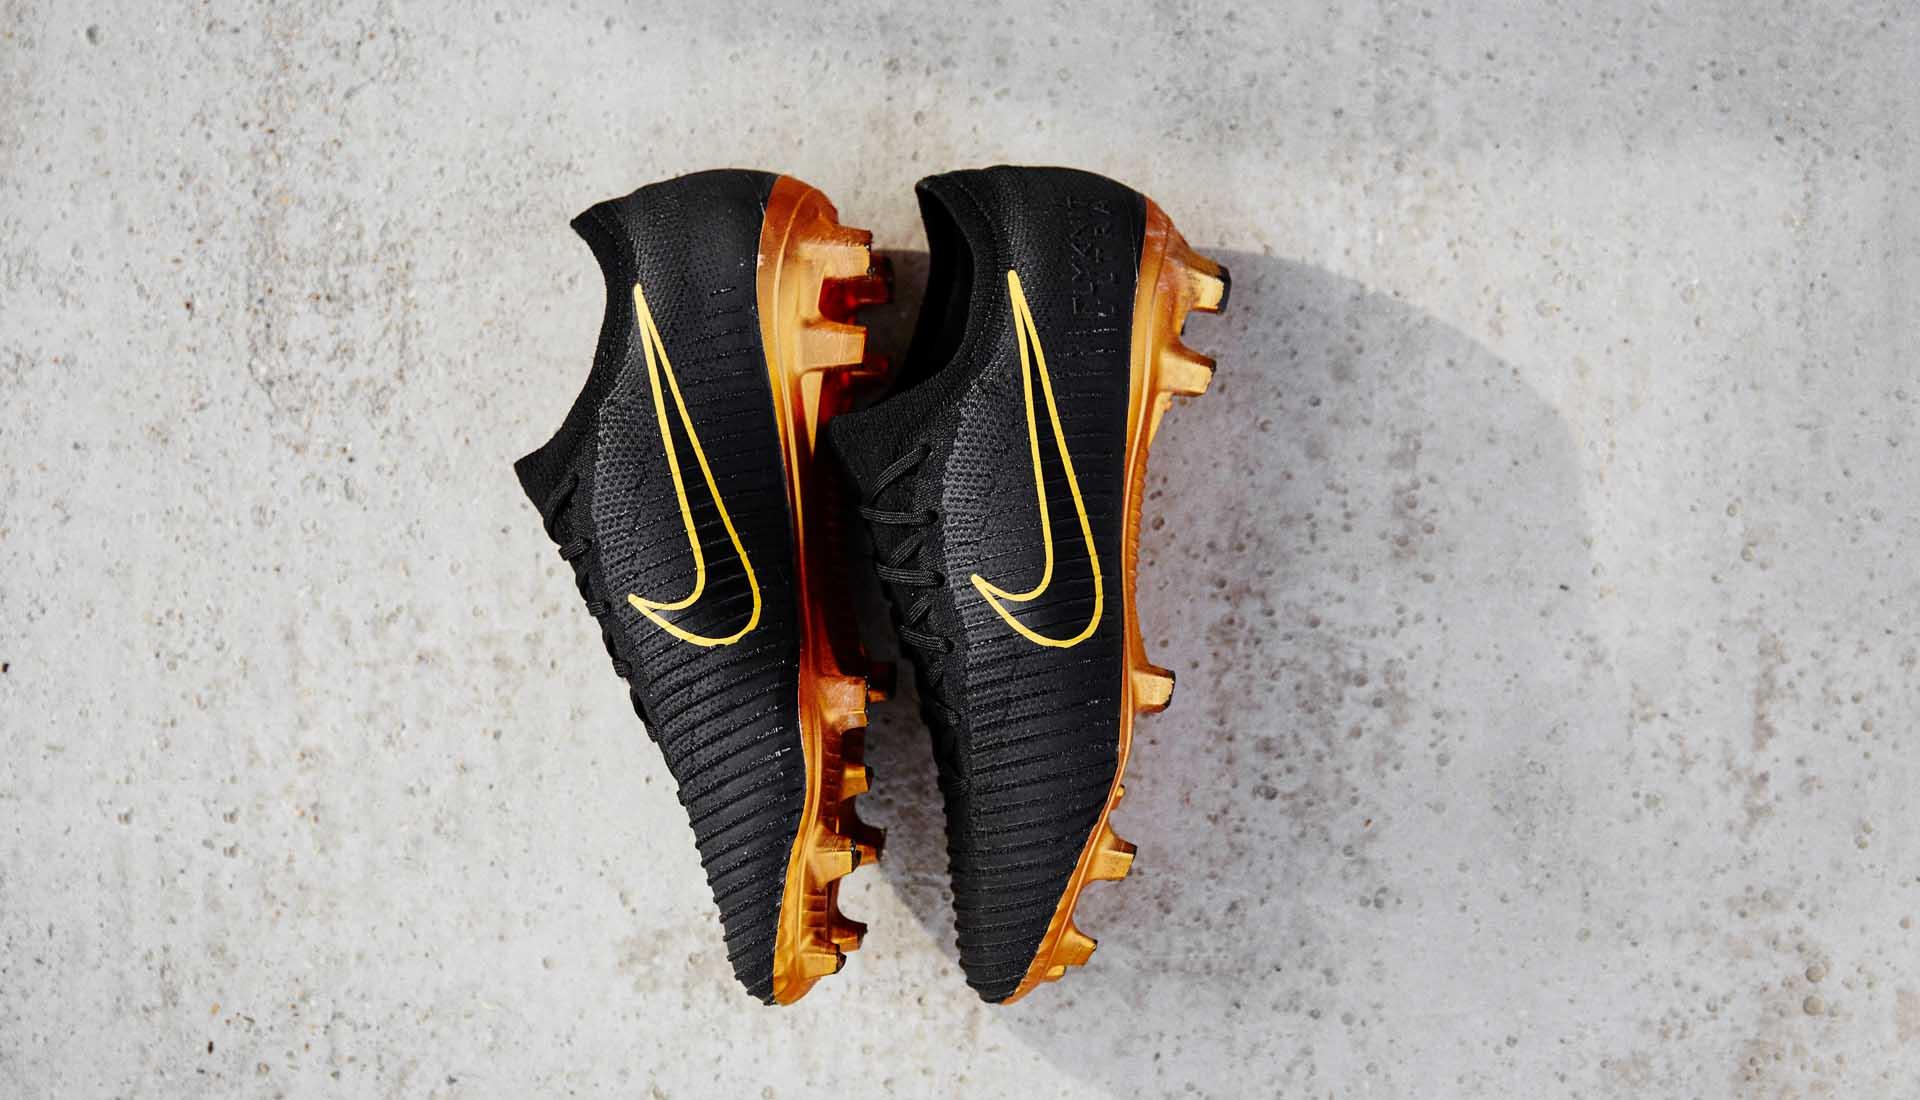 3e32bbe83179 Nike Launch The Mercurial Vapor Flyknit Ultra - SoccerBible